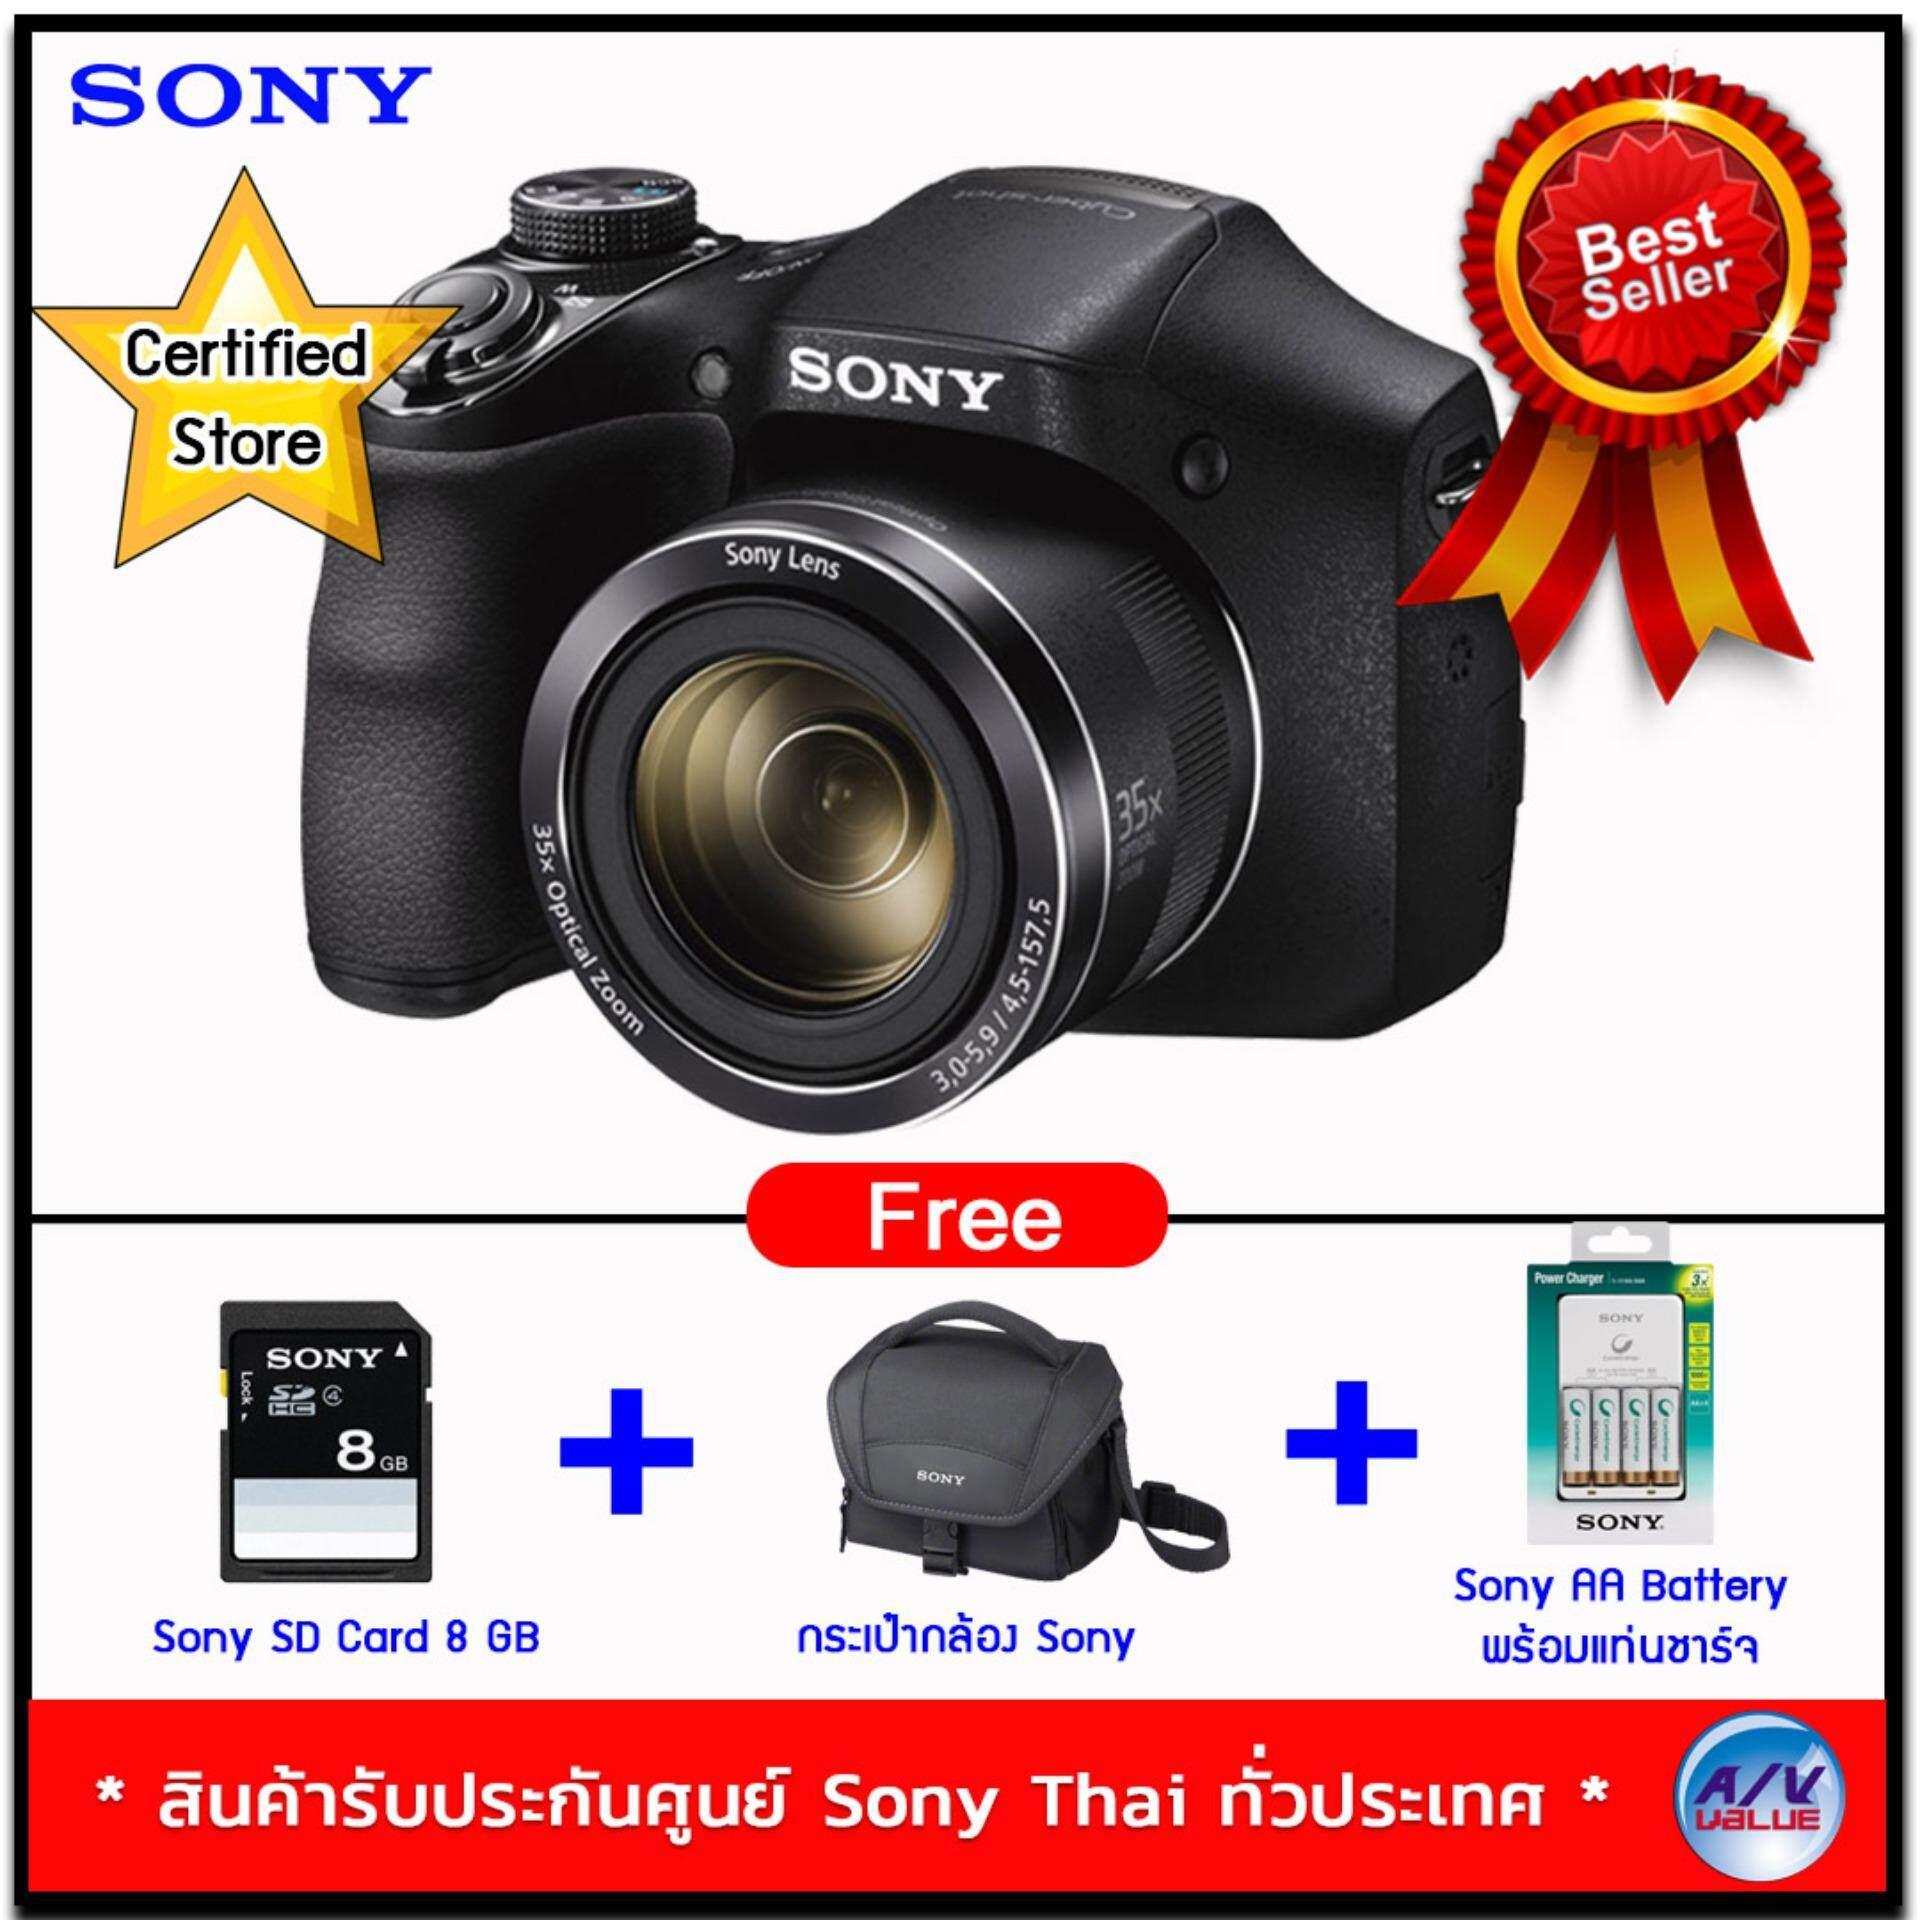 Sony Cyber Shot 20.1mp Dsc-H300 (แถมฟรี : กระเป๋ากล้องของsony + Sony Sd Card 8gb แถมเพิ่ม : ชุดแบตเตอรี่ 2a แบบชาร์จไฟได้ (4 ก้อน) พร้อมแท่นชาร์จแบตเตอรี่ของsony).